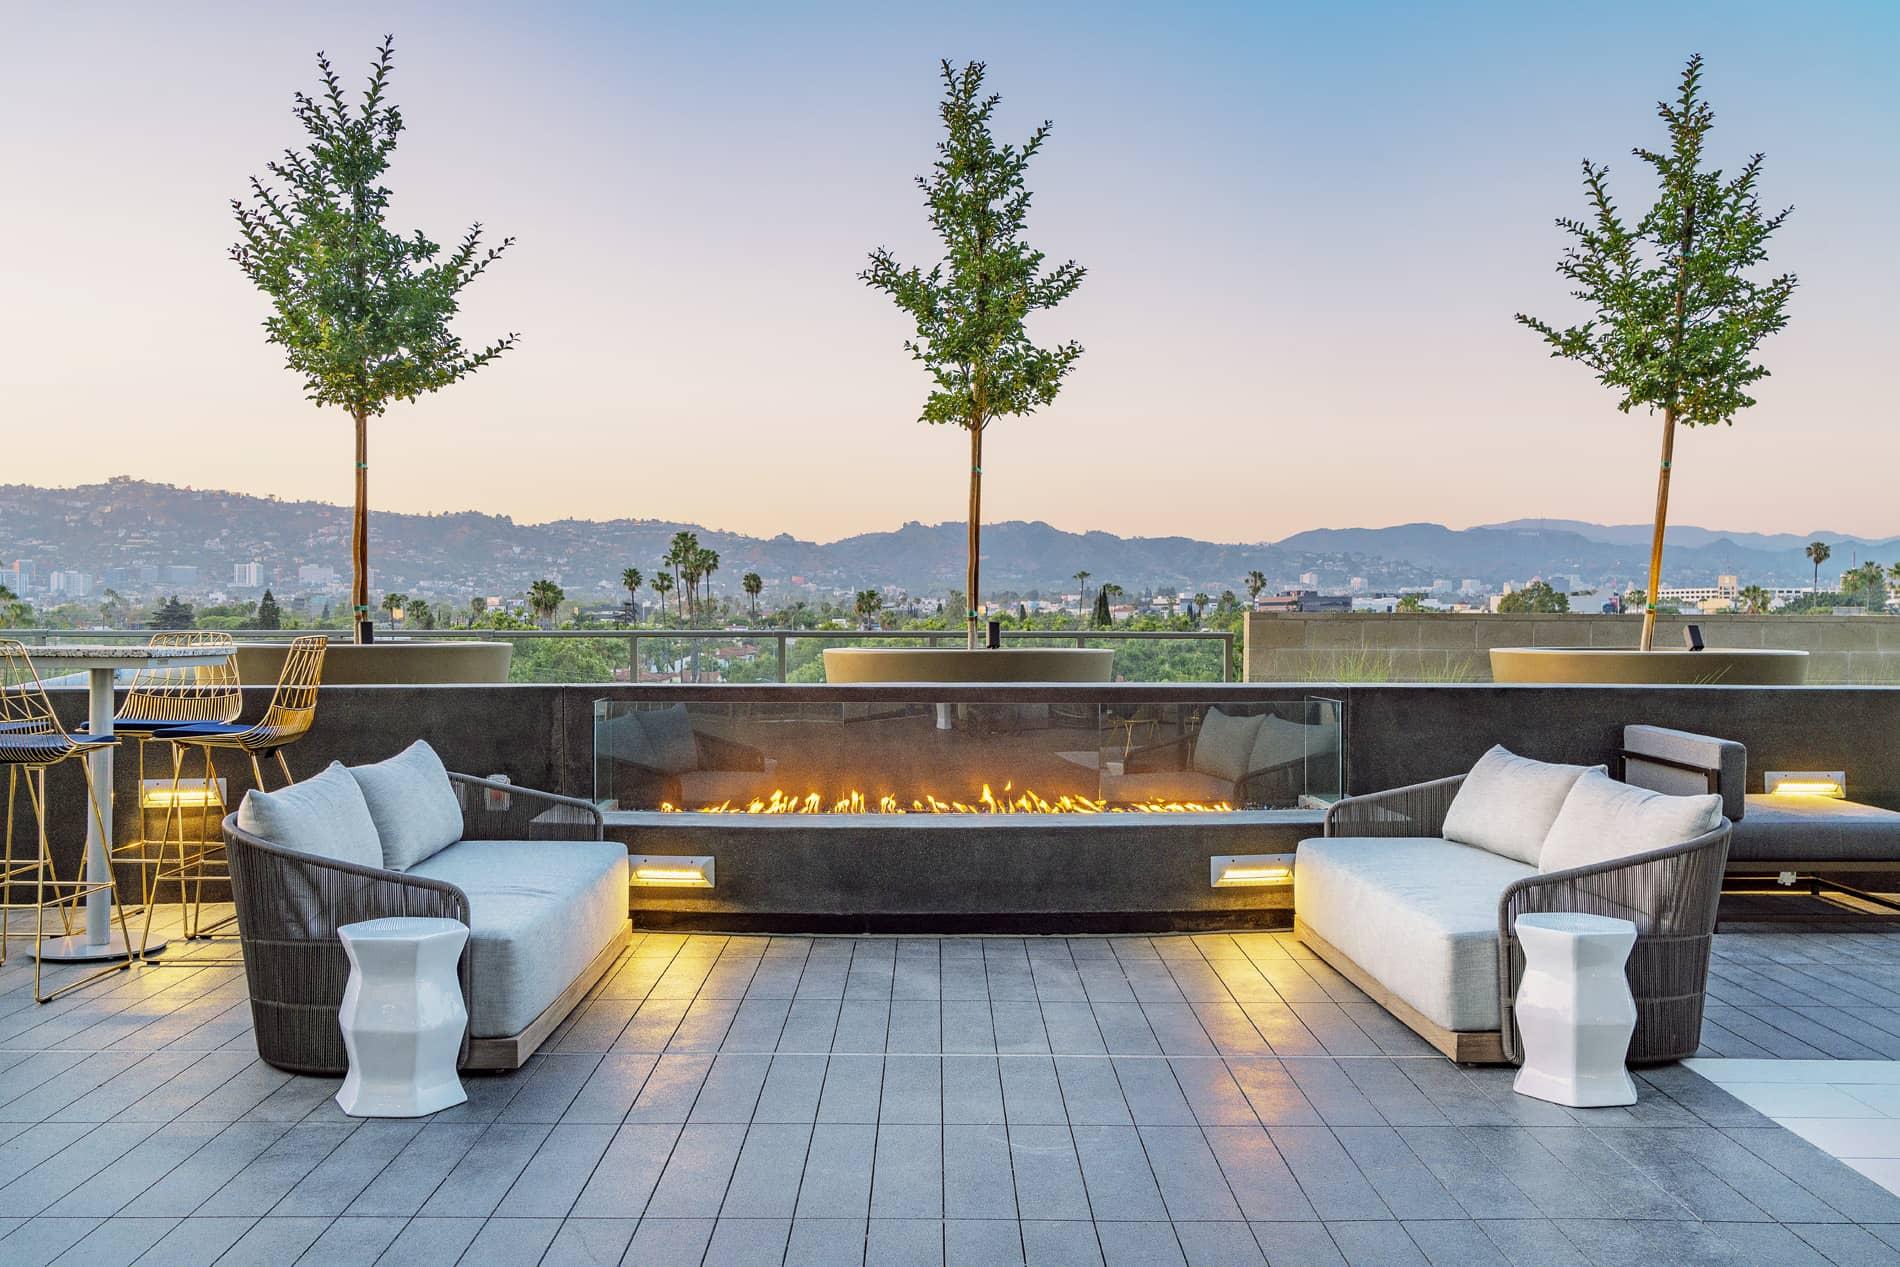 Vision on Wilshire Furnished Rental-Sample Image of Los Angeles CA Intern Home